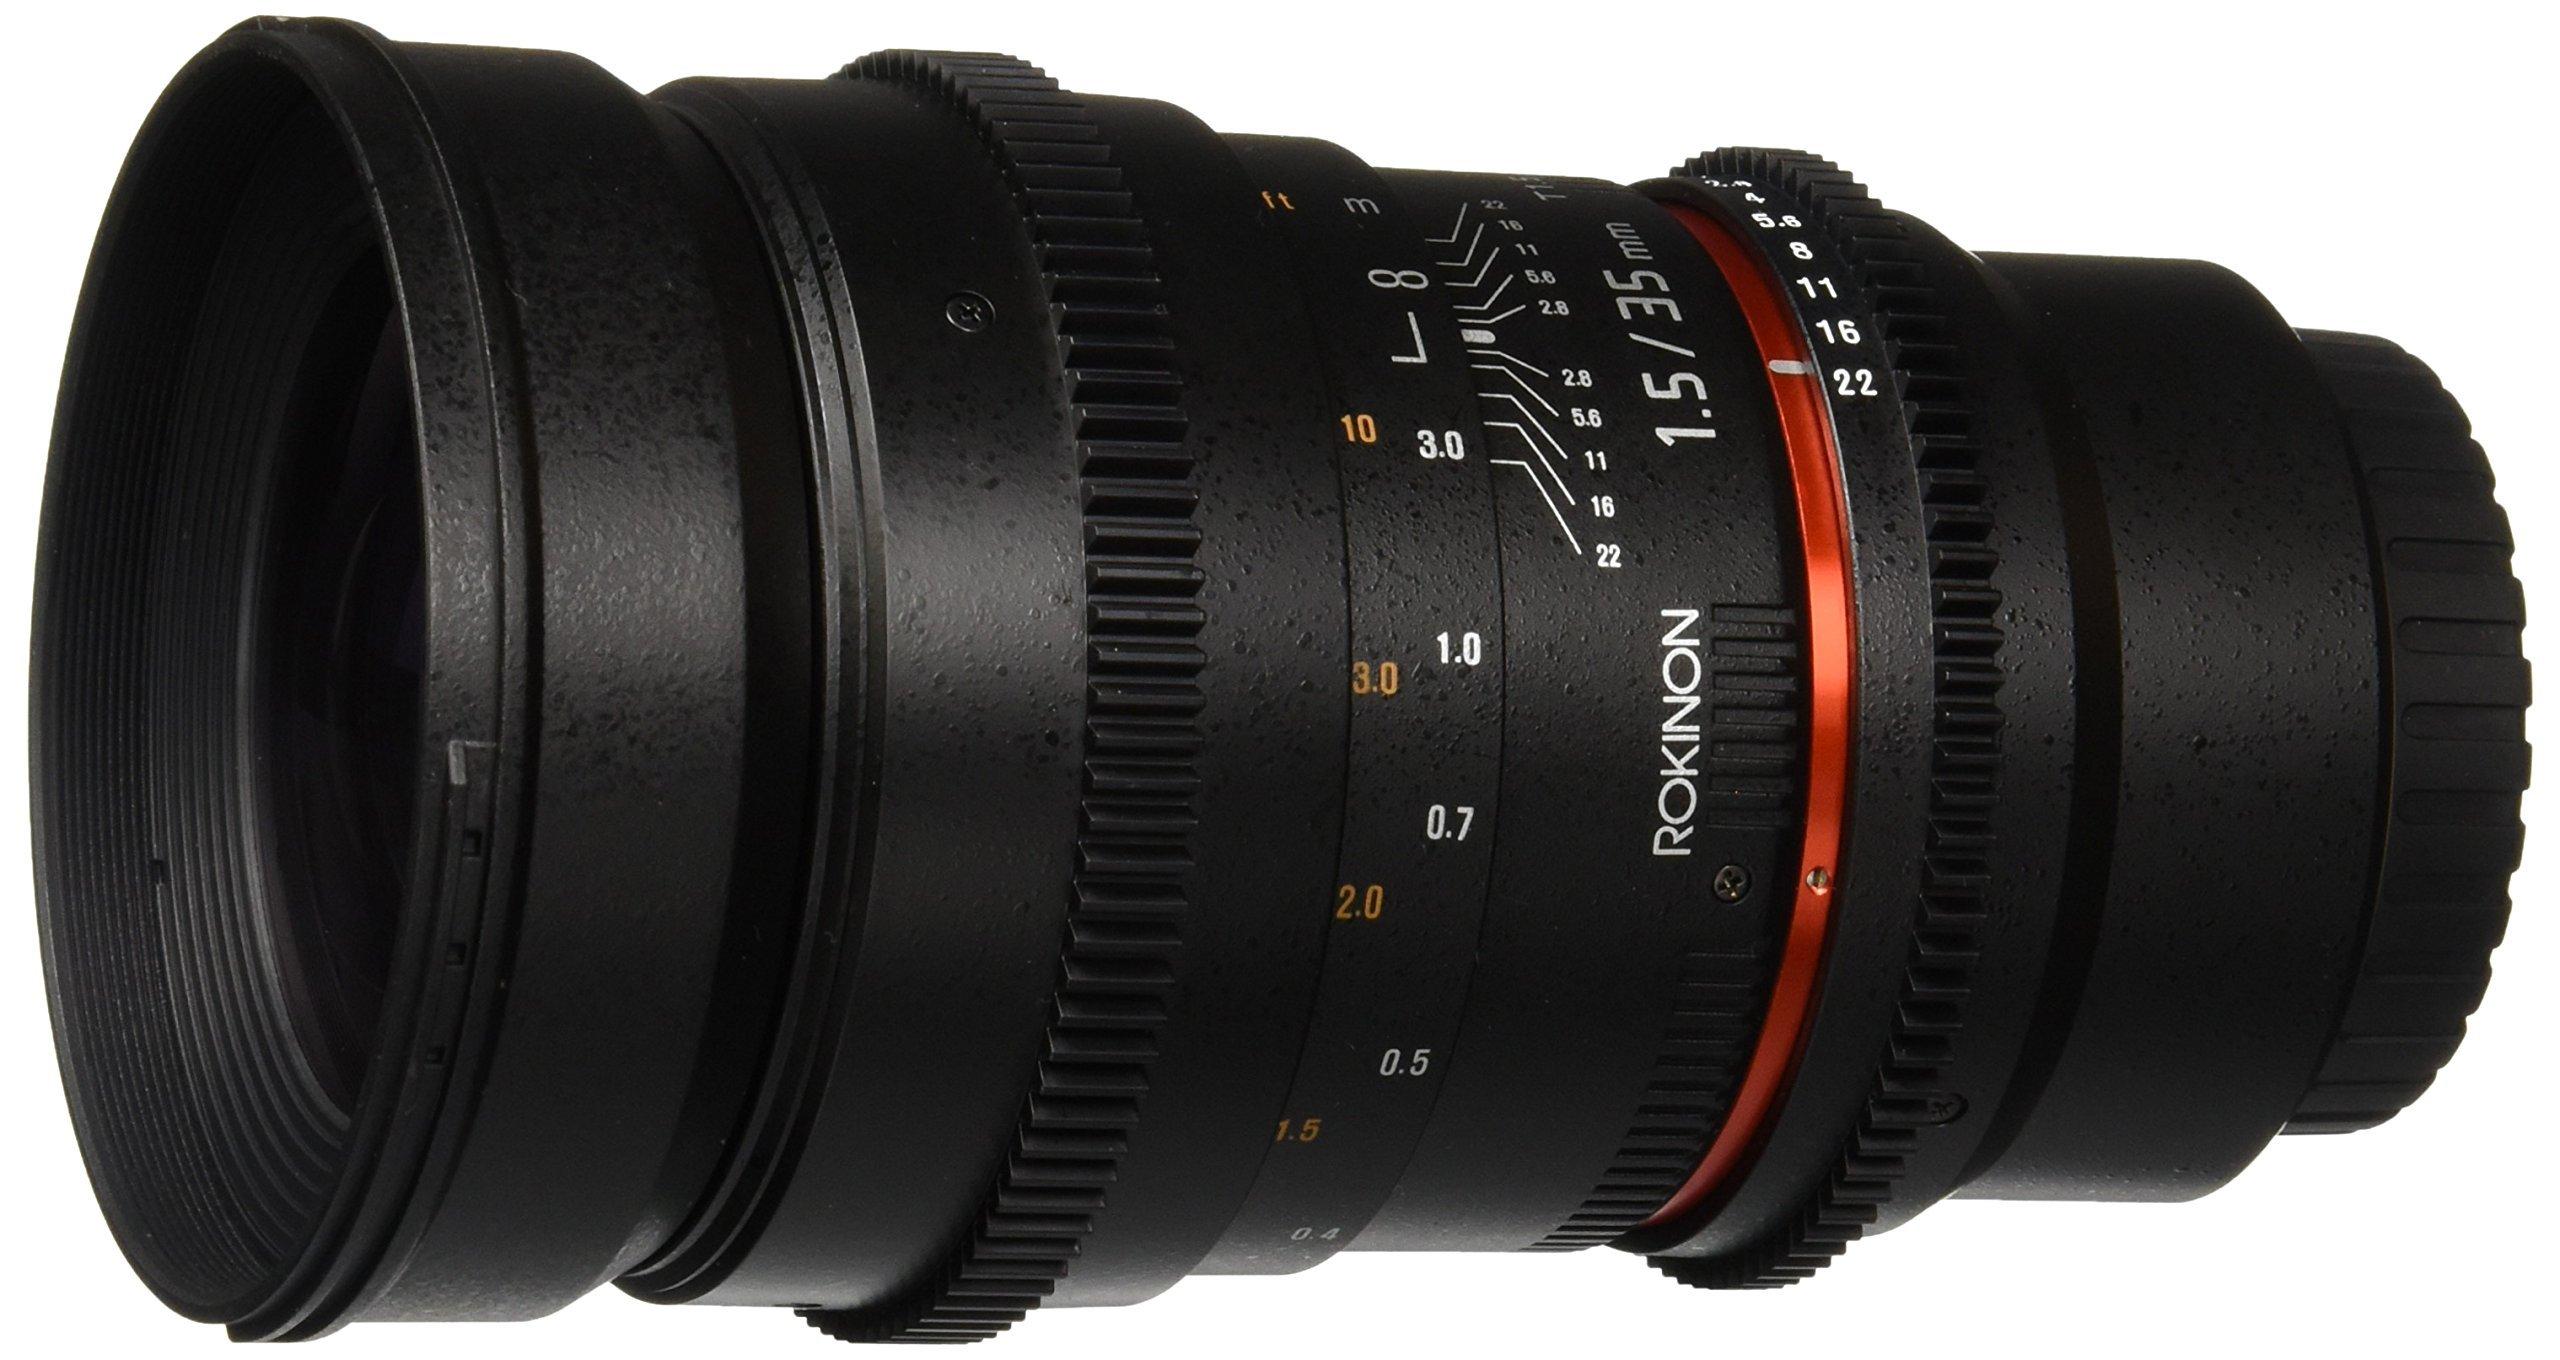 Rokinon 35mm T1.5 ED AS IF UMC Cine Wide Angle Lens for Olympus and Panasonic Micro 4/3 (MFT) Mount Digital Cameras (CV35M-MFT)